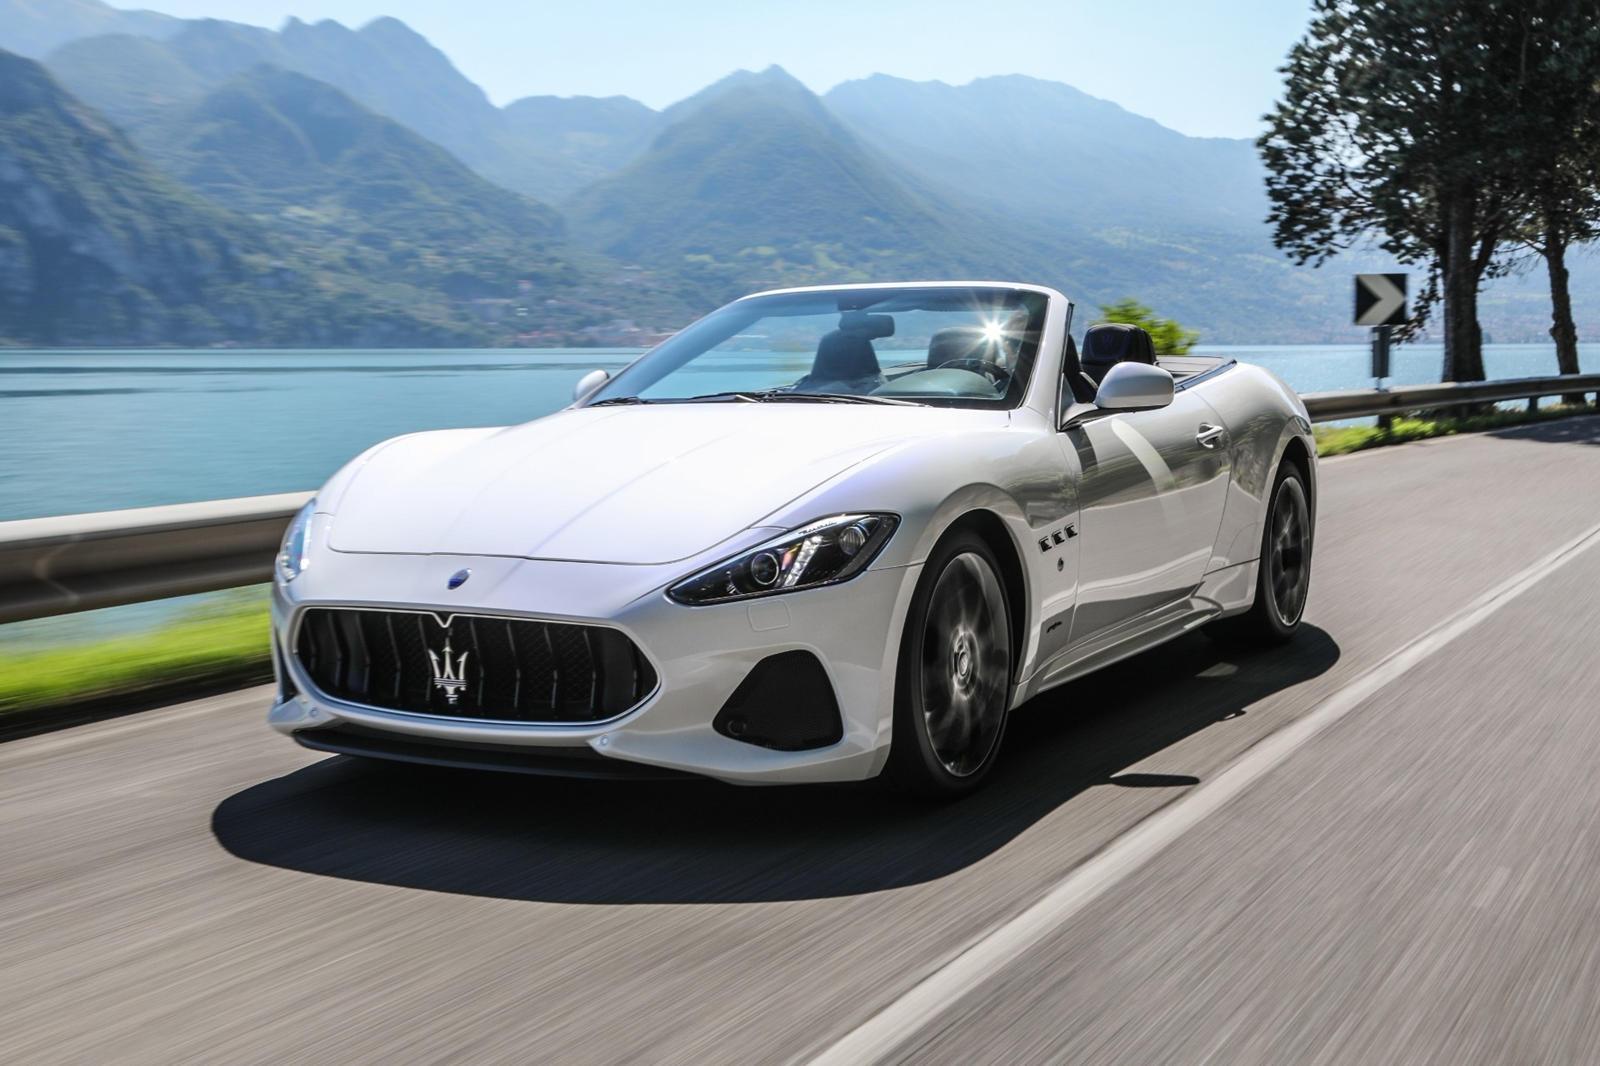 2019 Maserati GranTurismo Convertible: Review, Trims ...